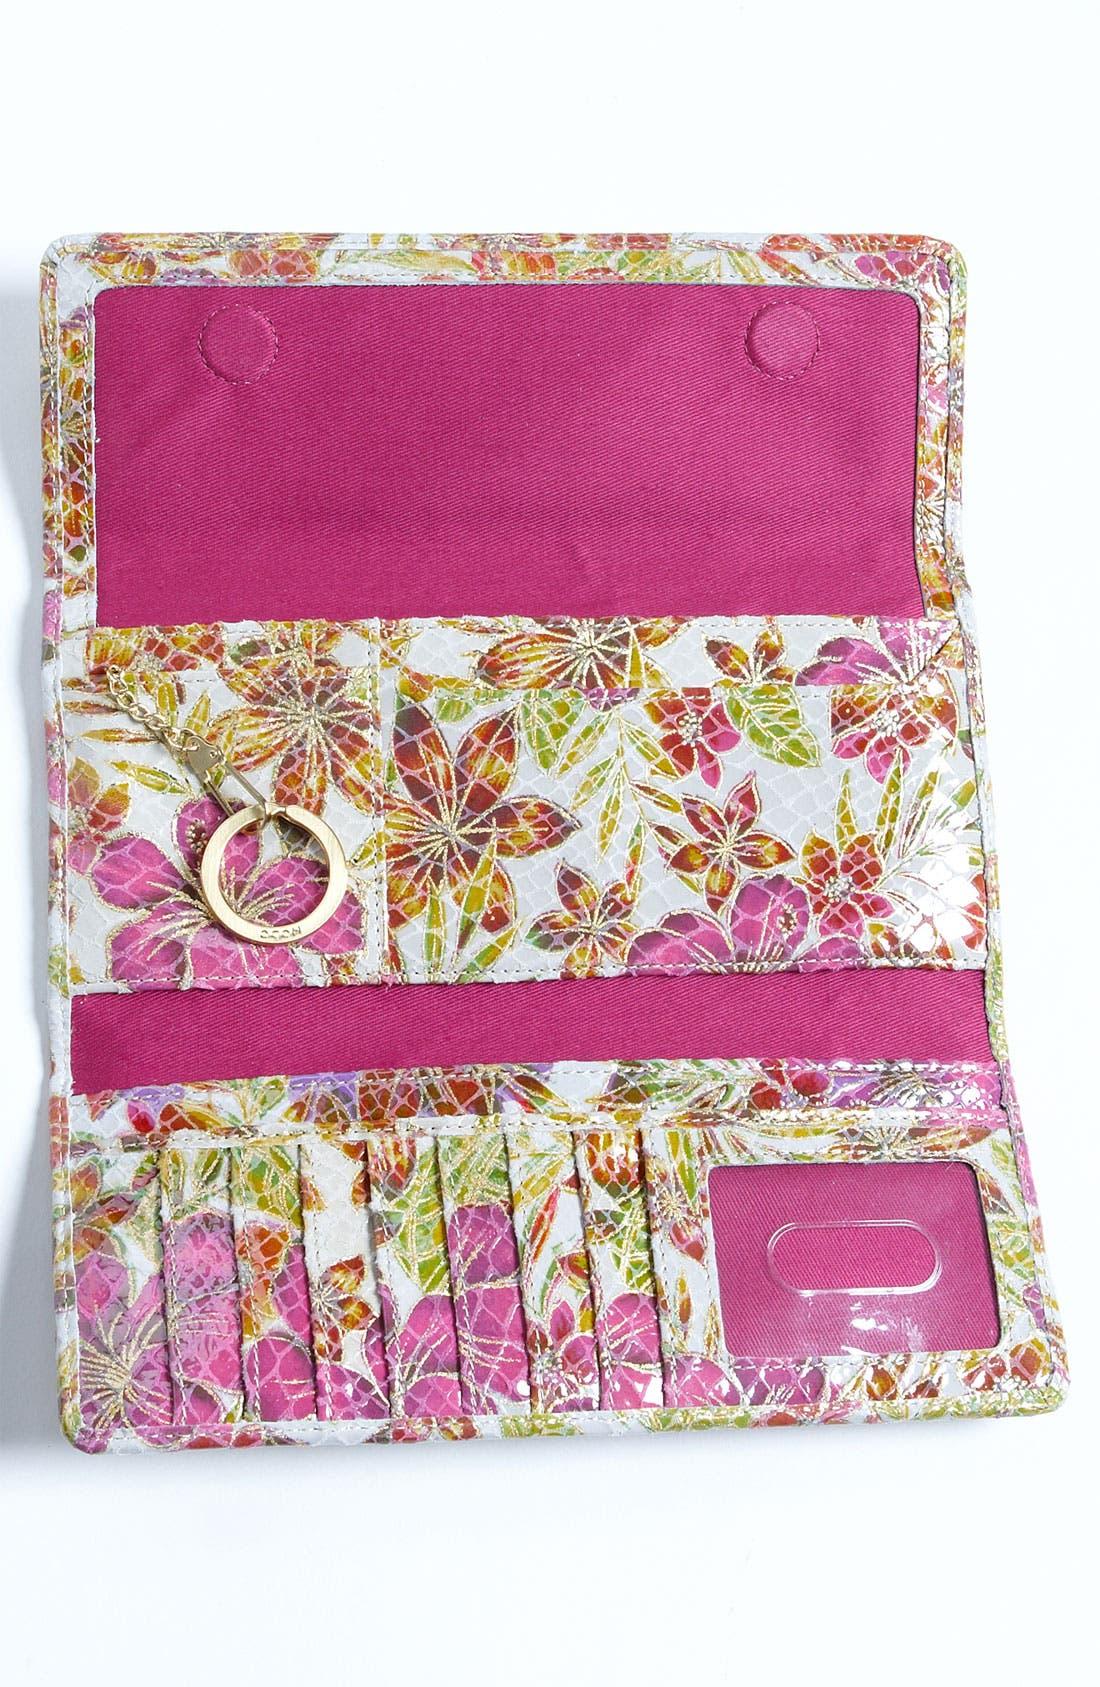 'Sadie' Leather Wallet,                             Alternate thumbnail 158, color,